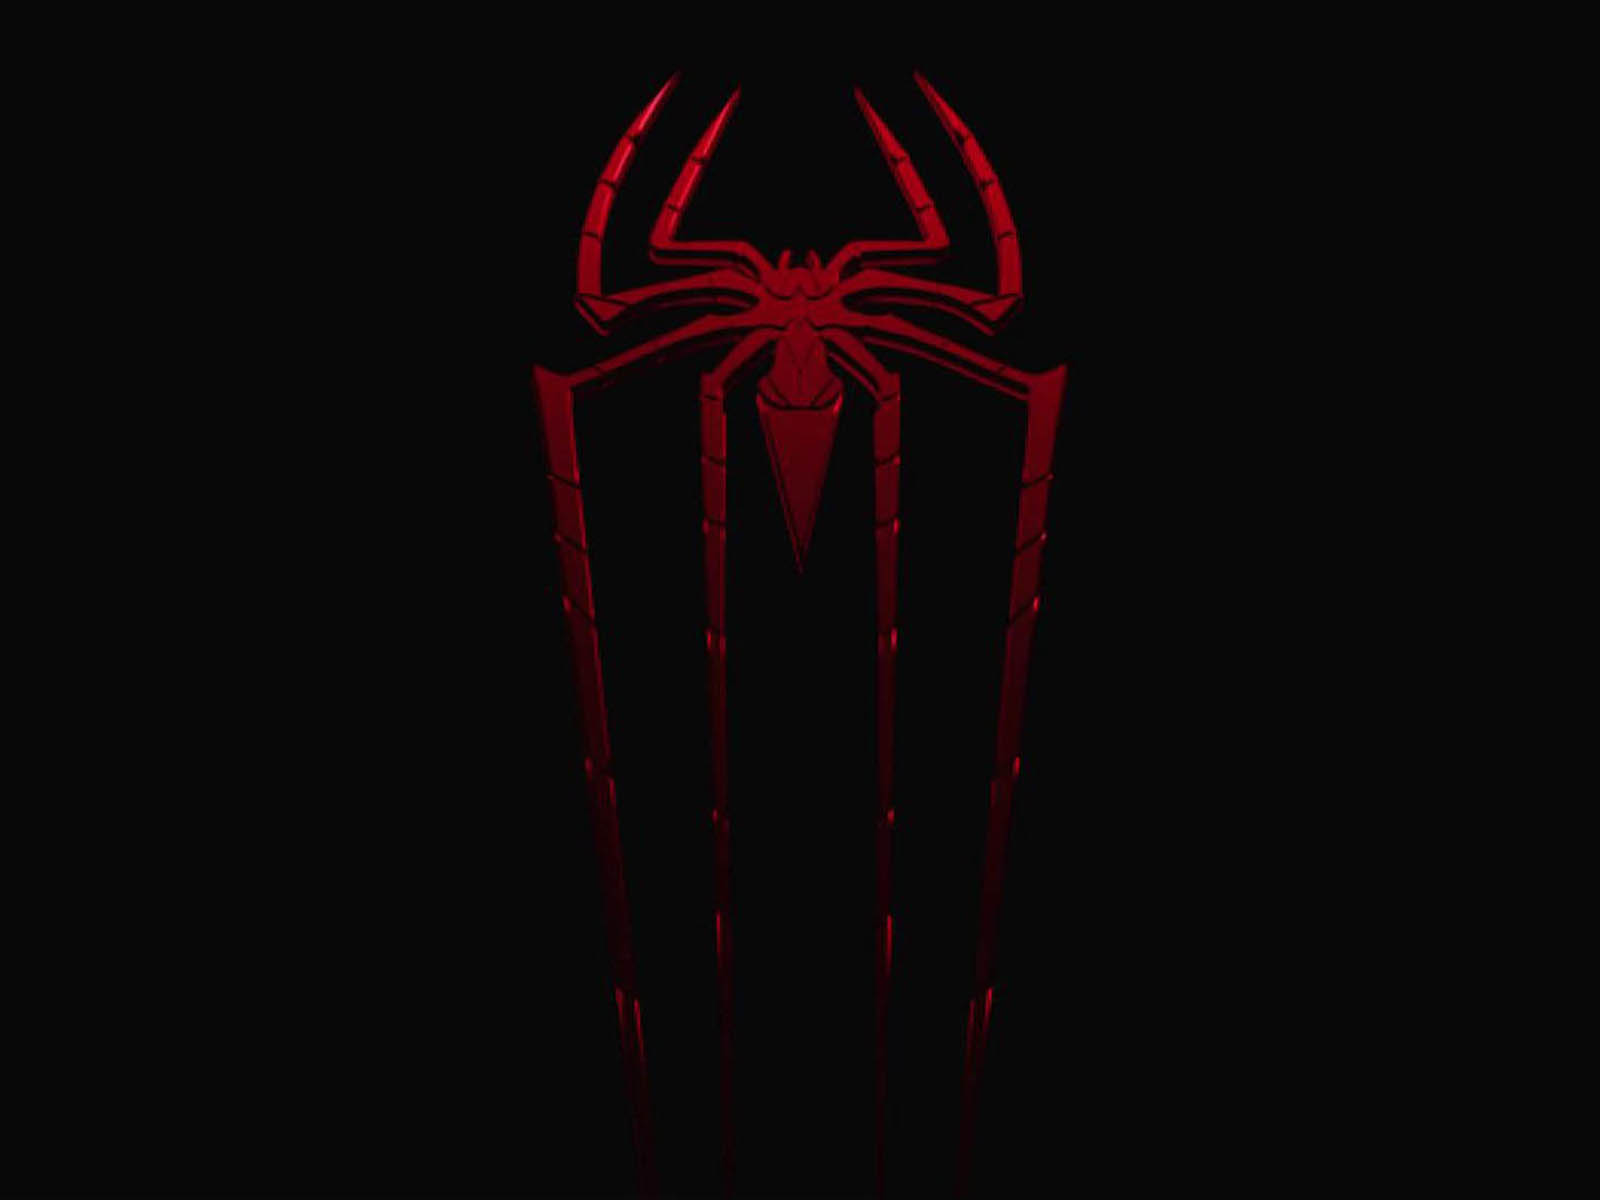 The amazing spider man Logos.